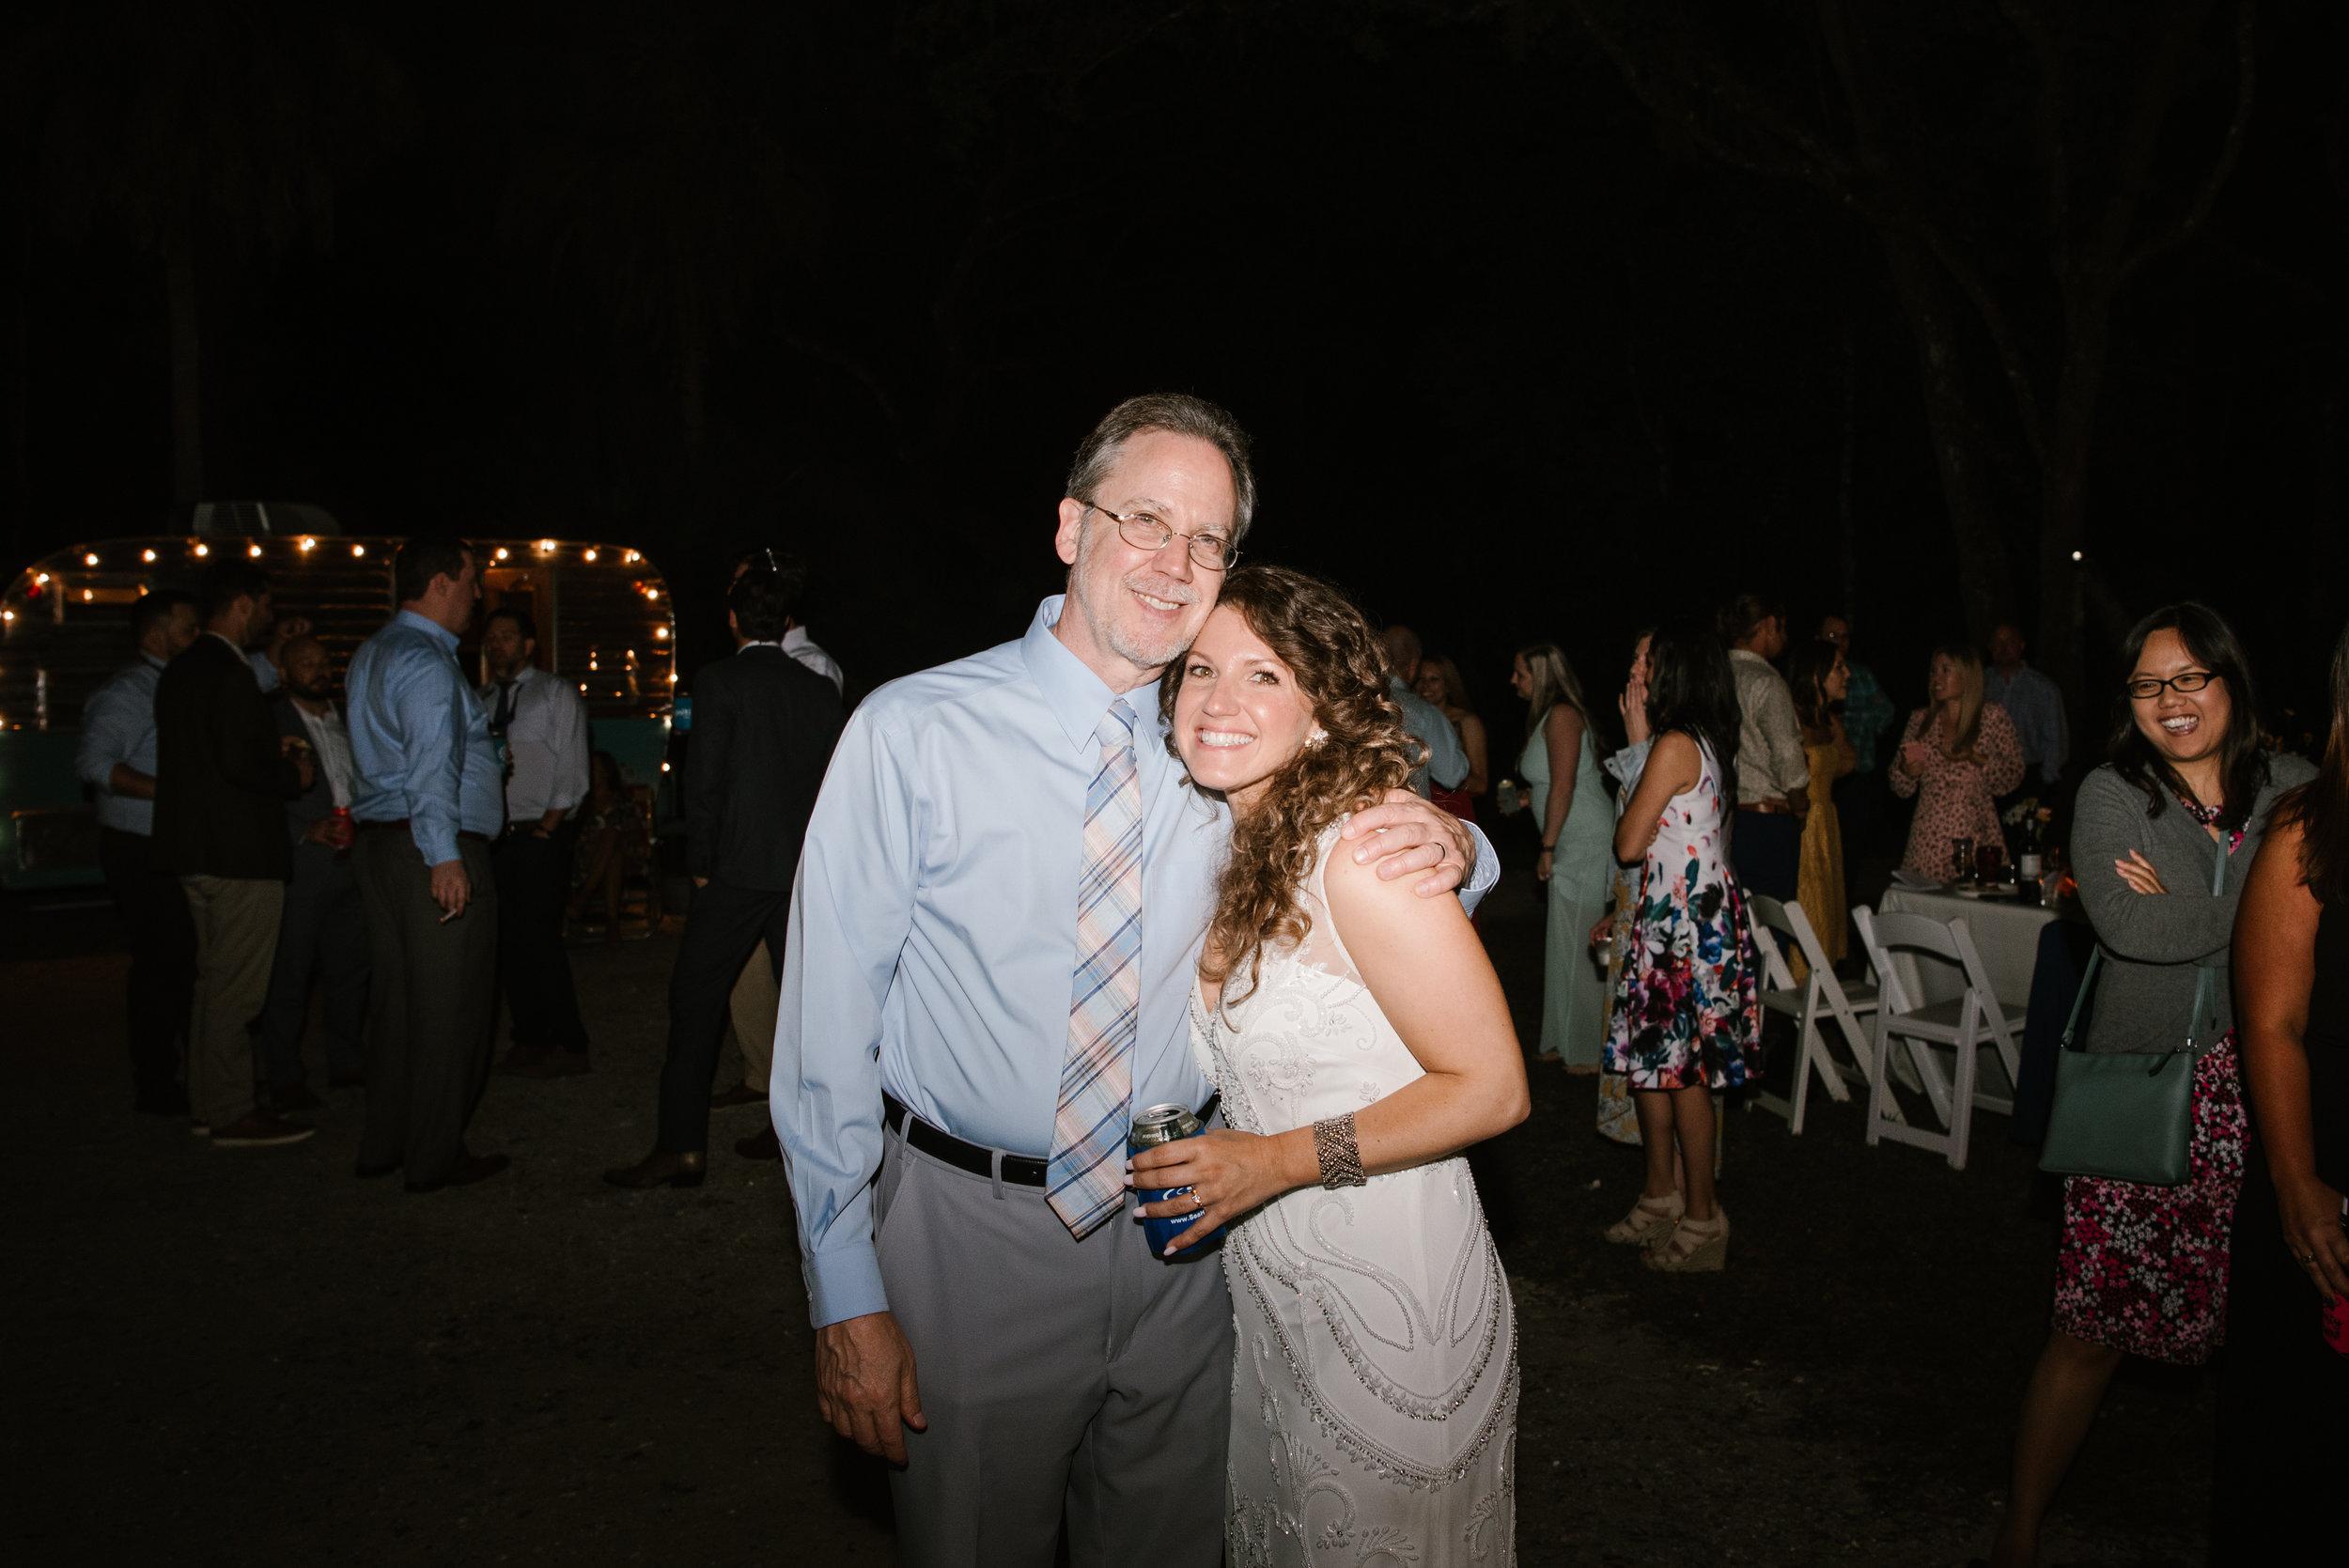 mclaughlin-wedding-1125.jpg